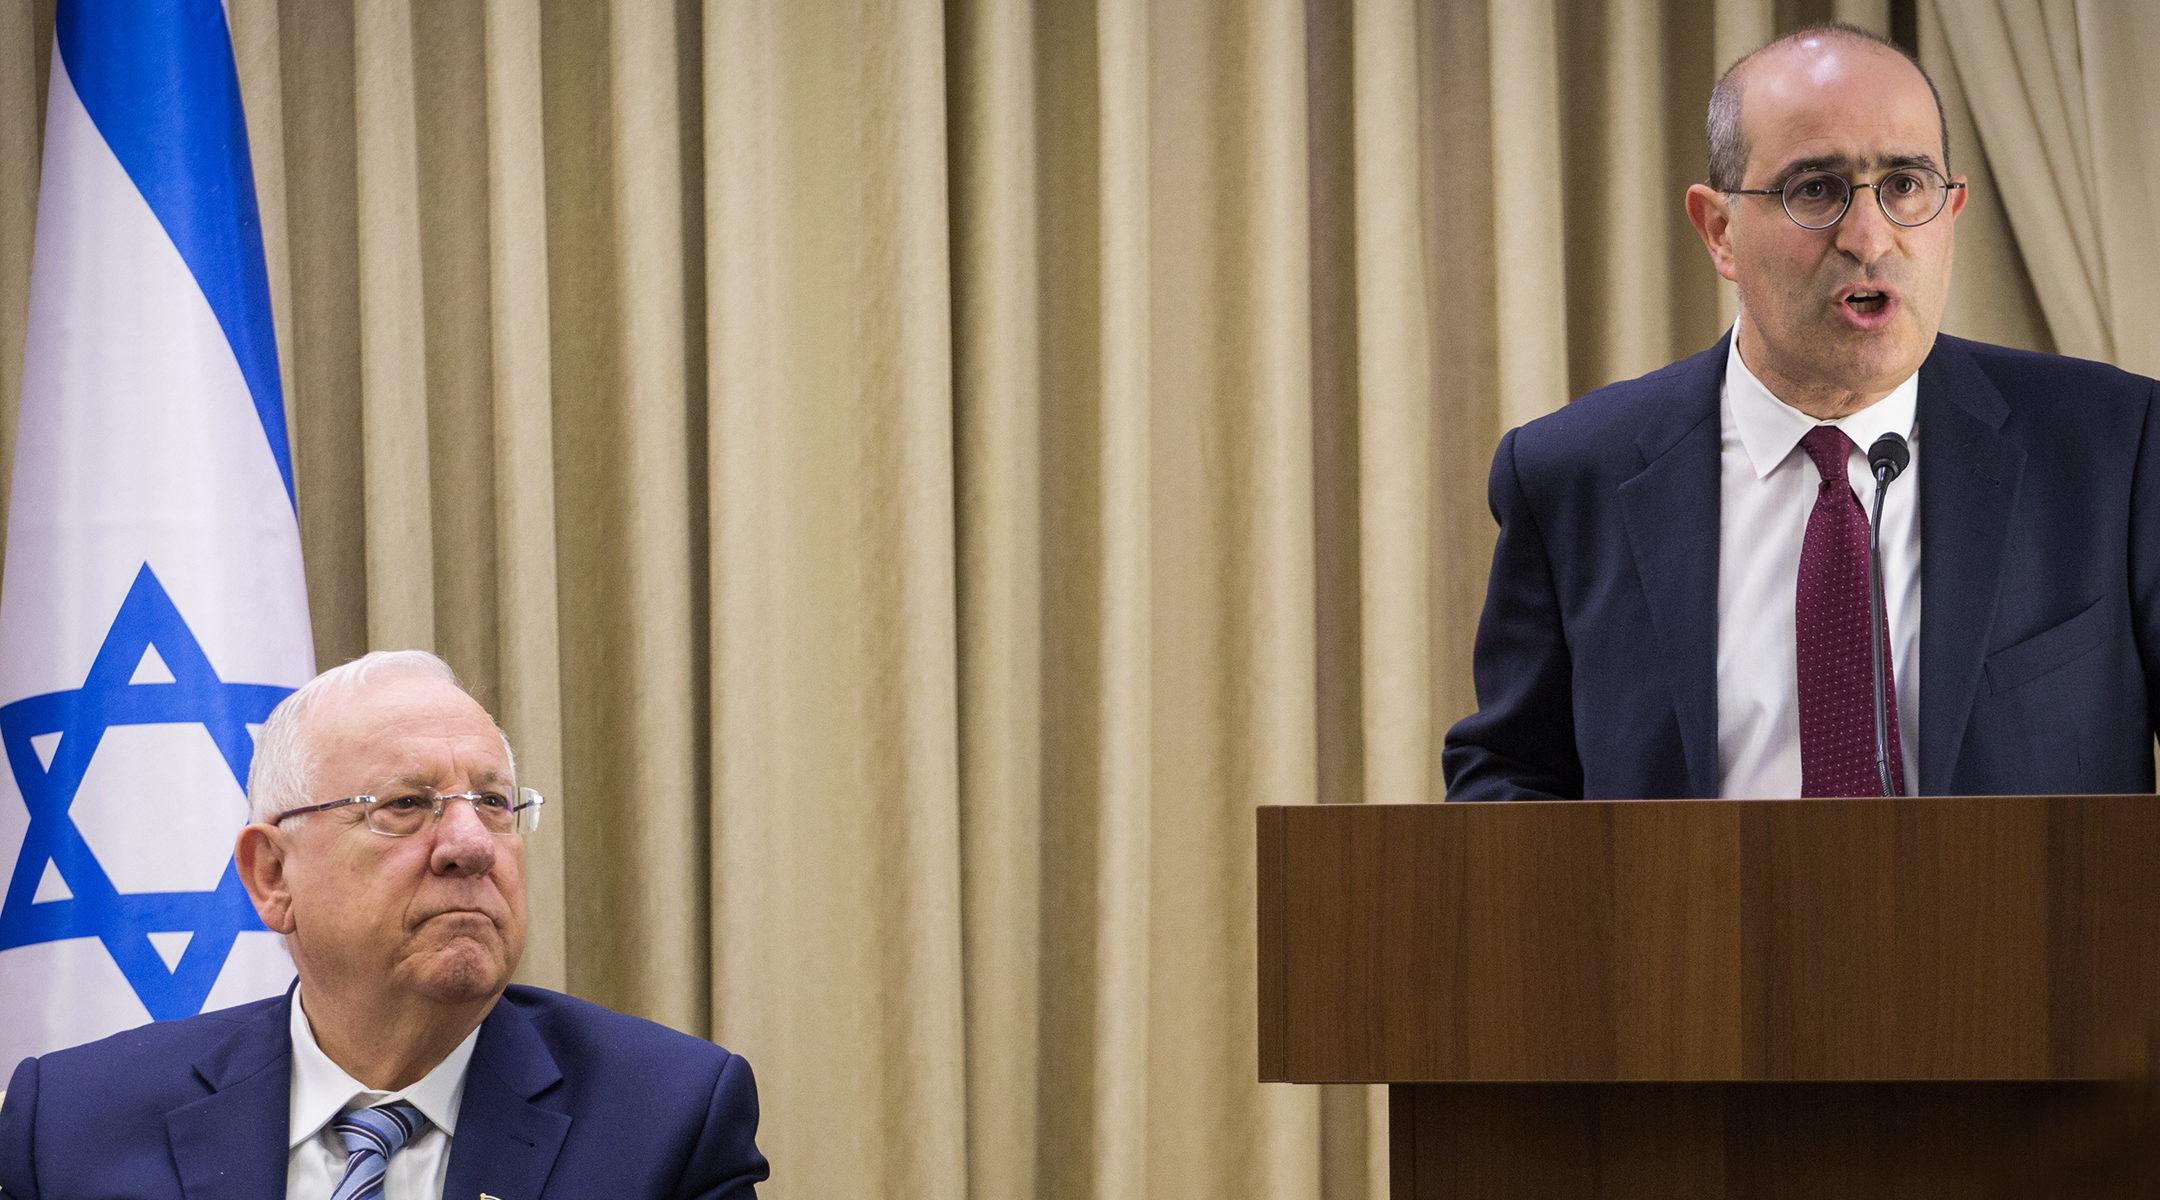 Gideon Taylor, right, speaking alongside Israeli President Reuven Rivlin in Jerusalem in 2017. Hadas Parush Flash90